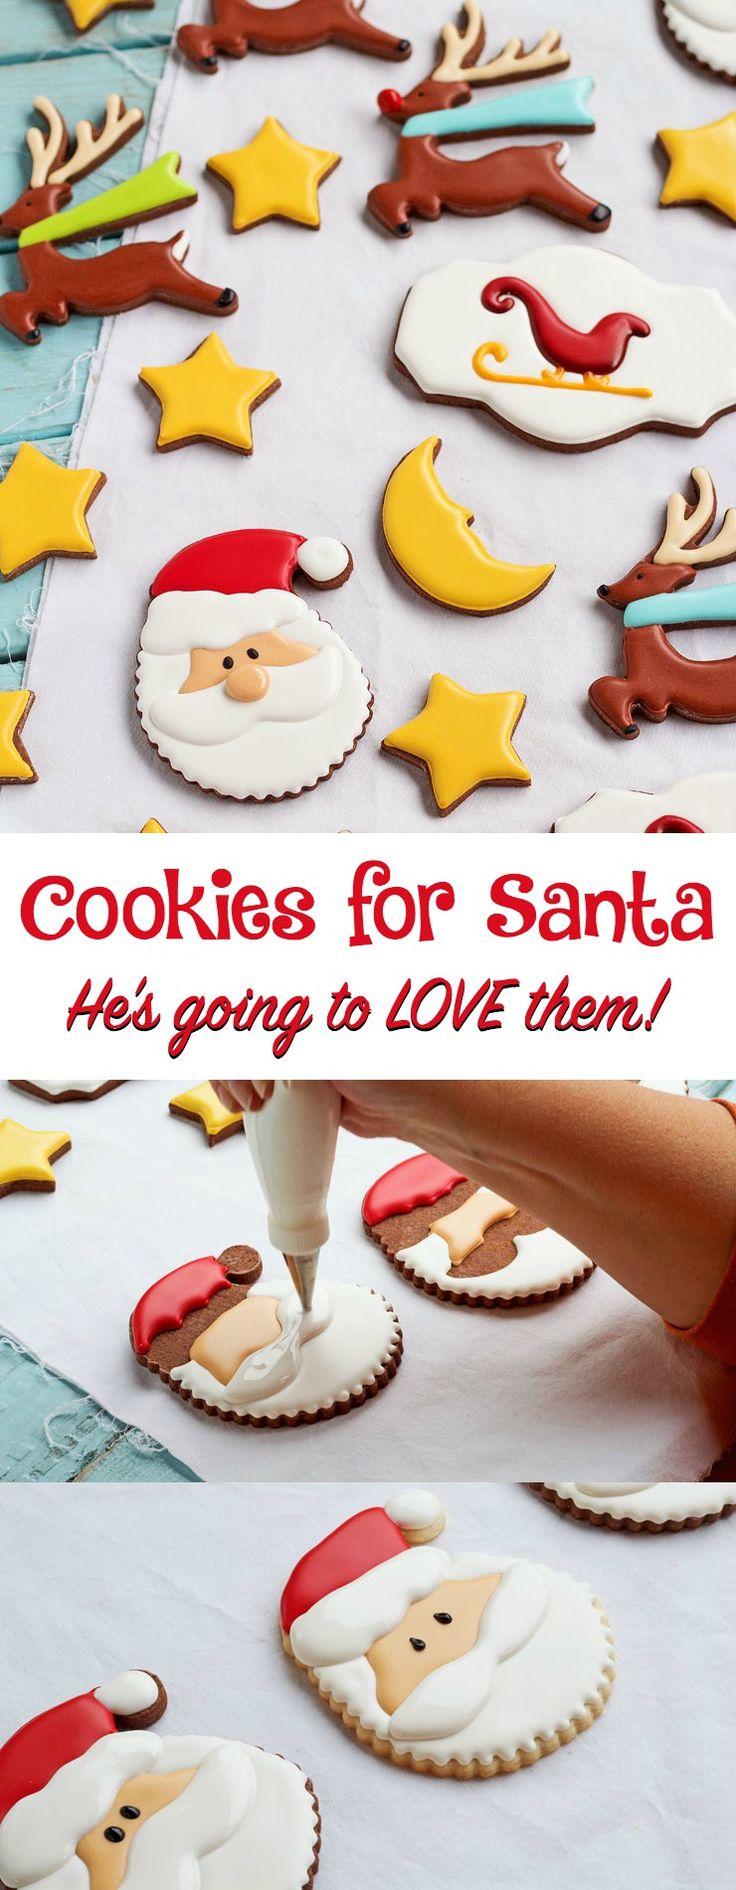 Christmas Cookies for Santa Sinmple Decorated Santa Sugar Cookieswww.thebearfootbaker.com